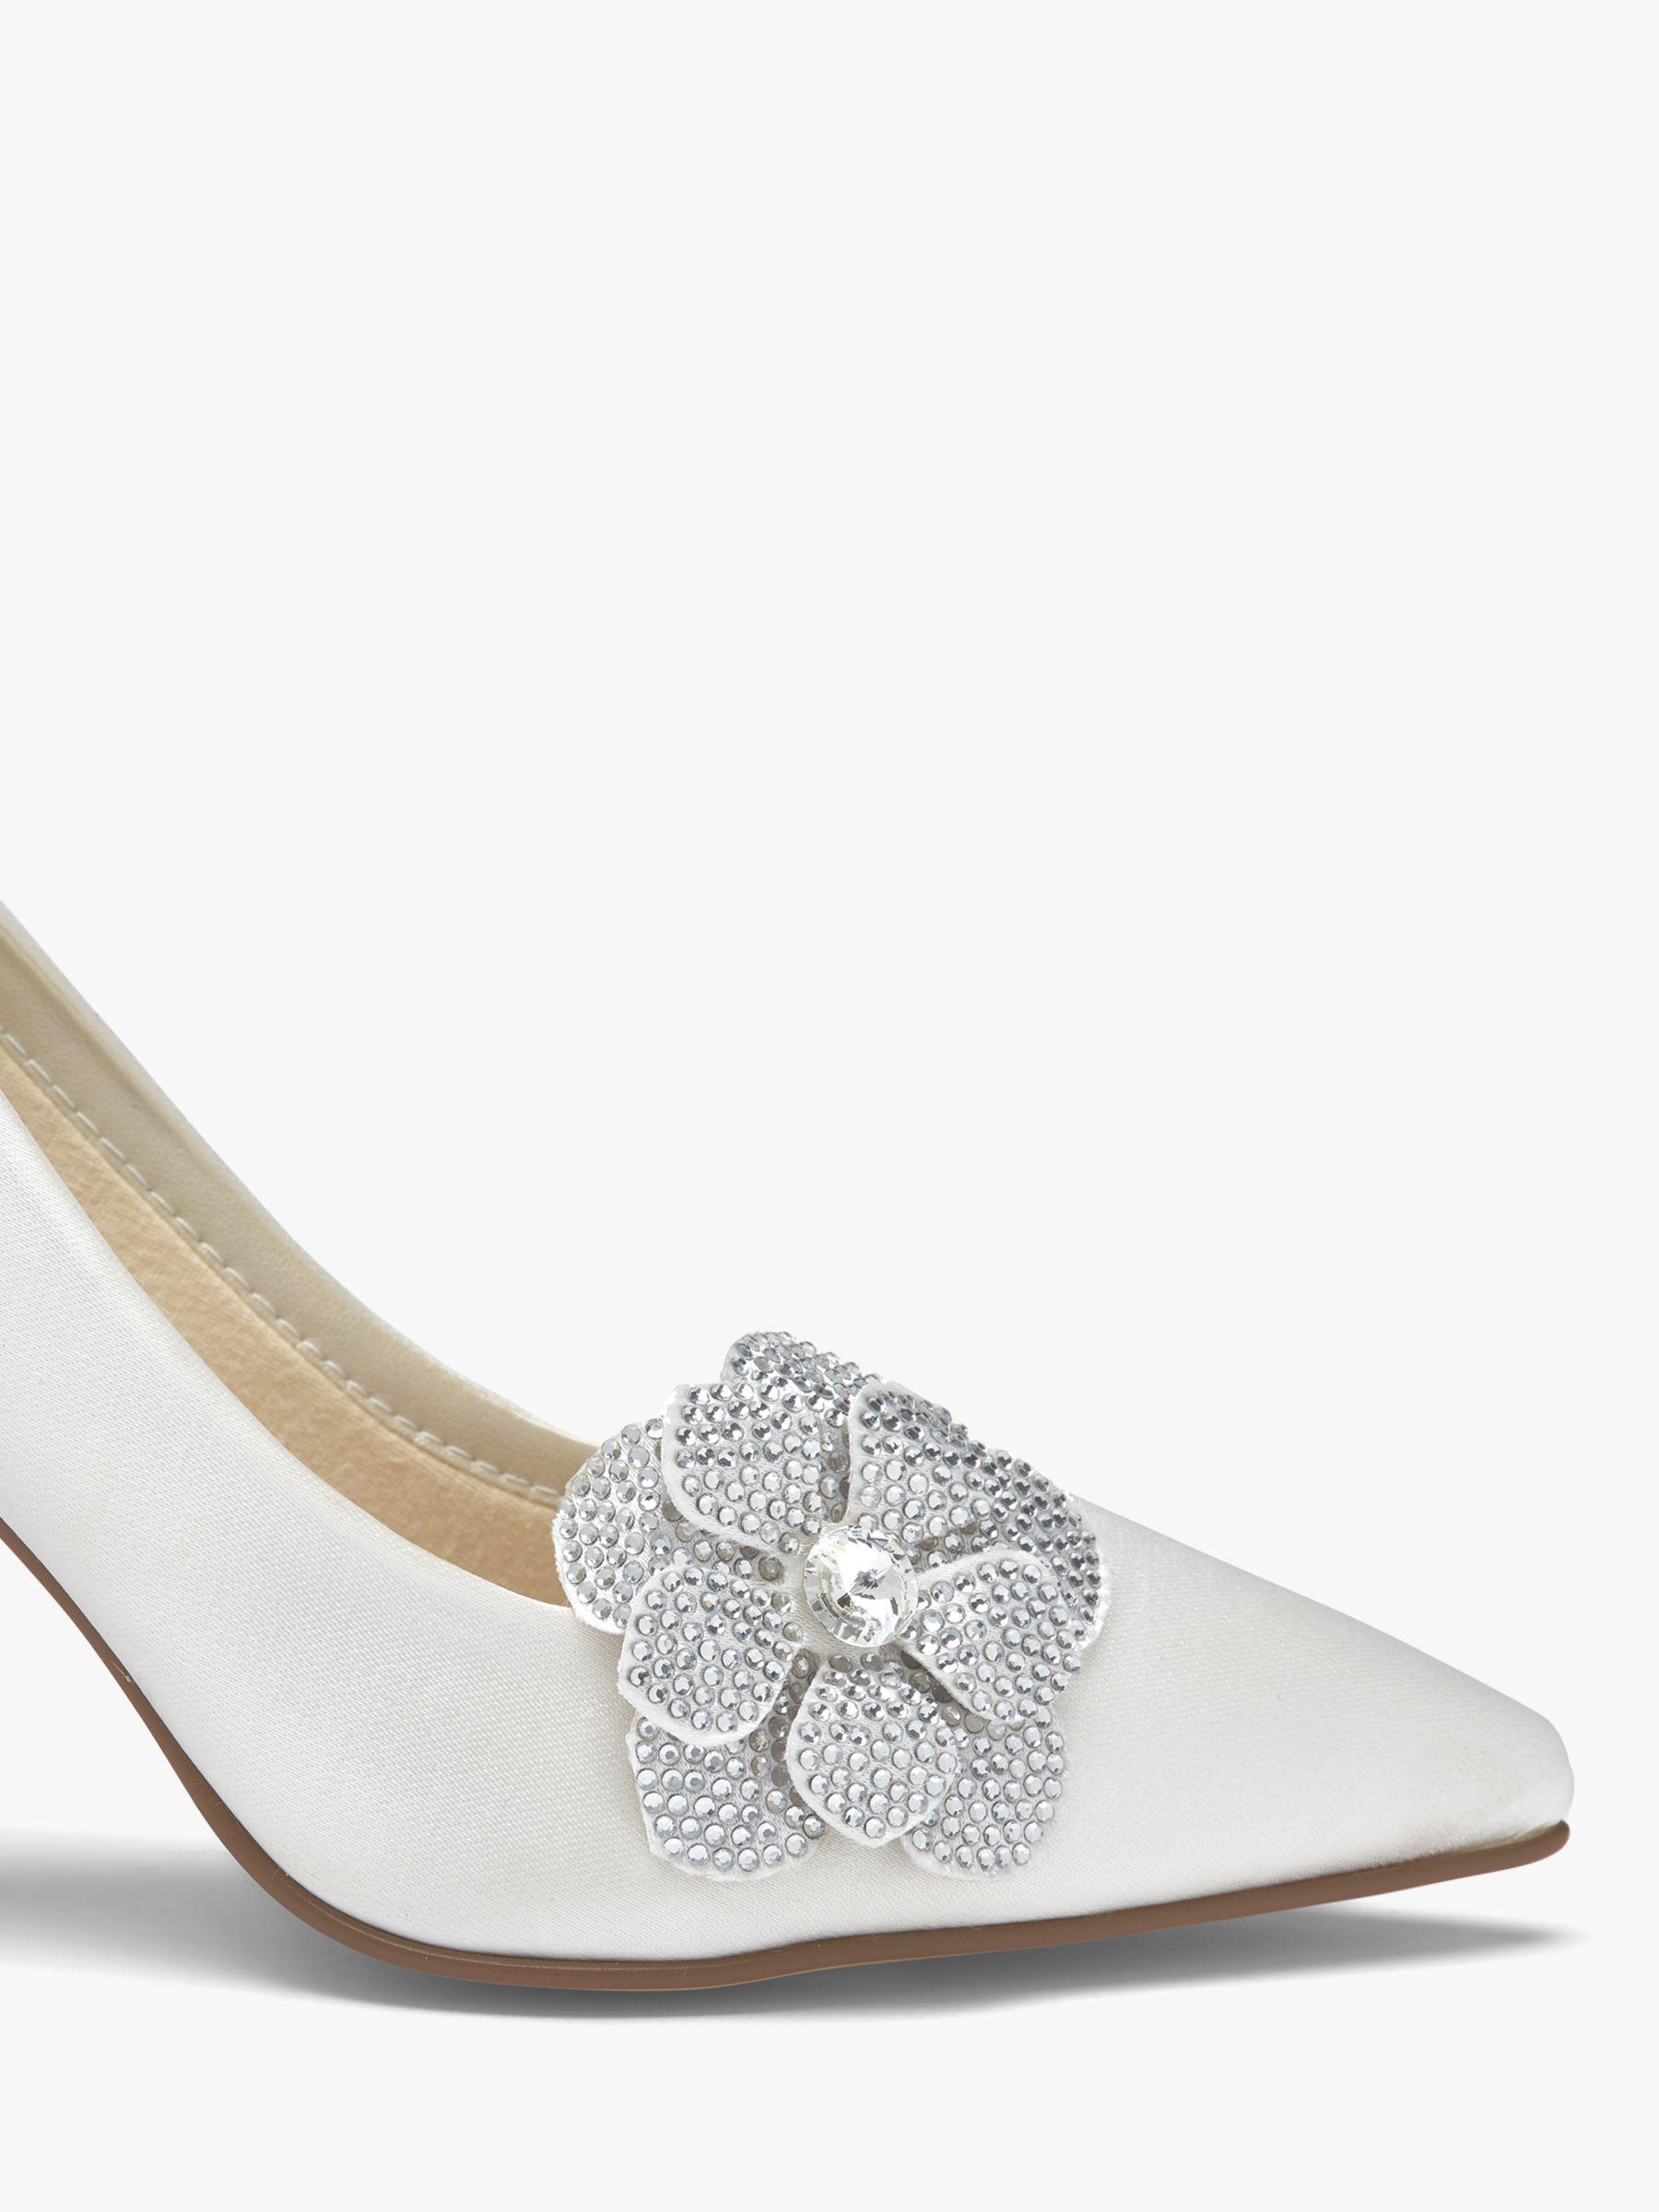 Rainbow Club Rainbow Club Vela Diamanté Flower Shoe Bows, Ivory